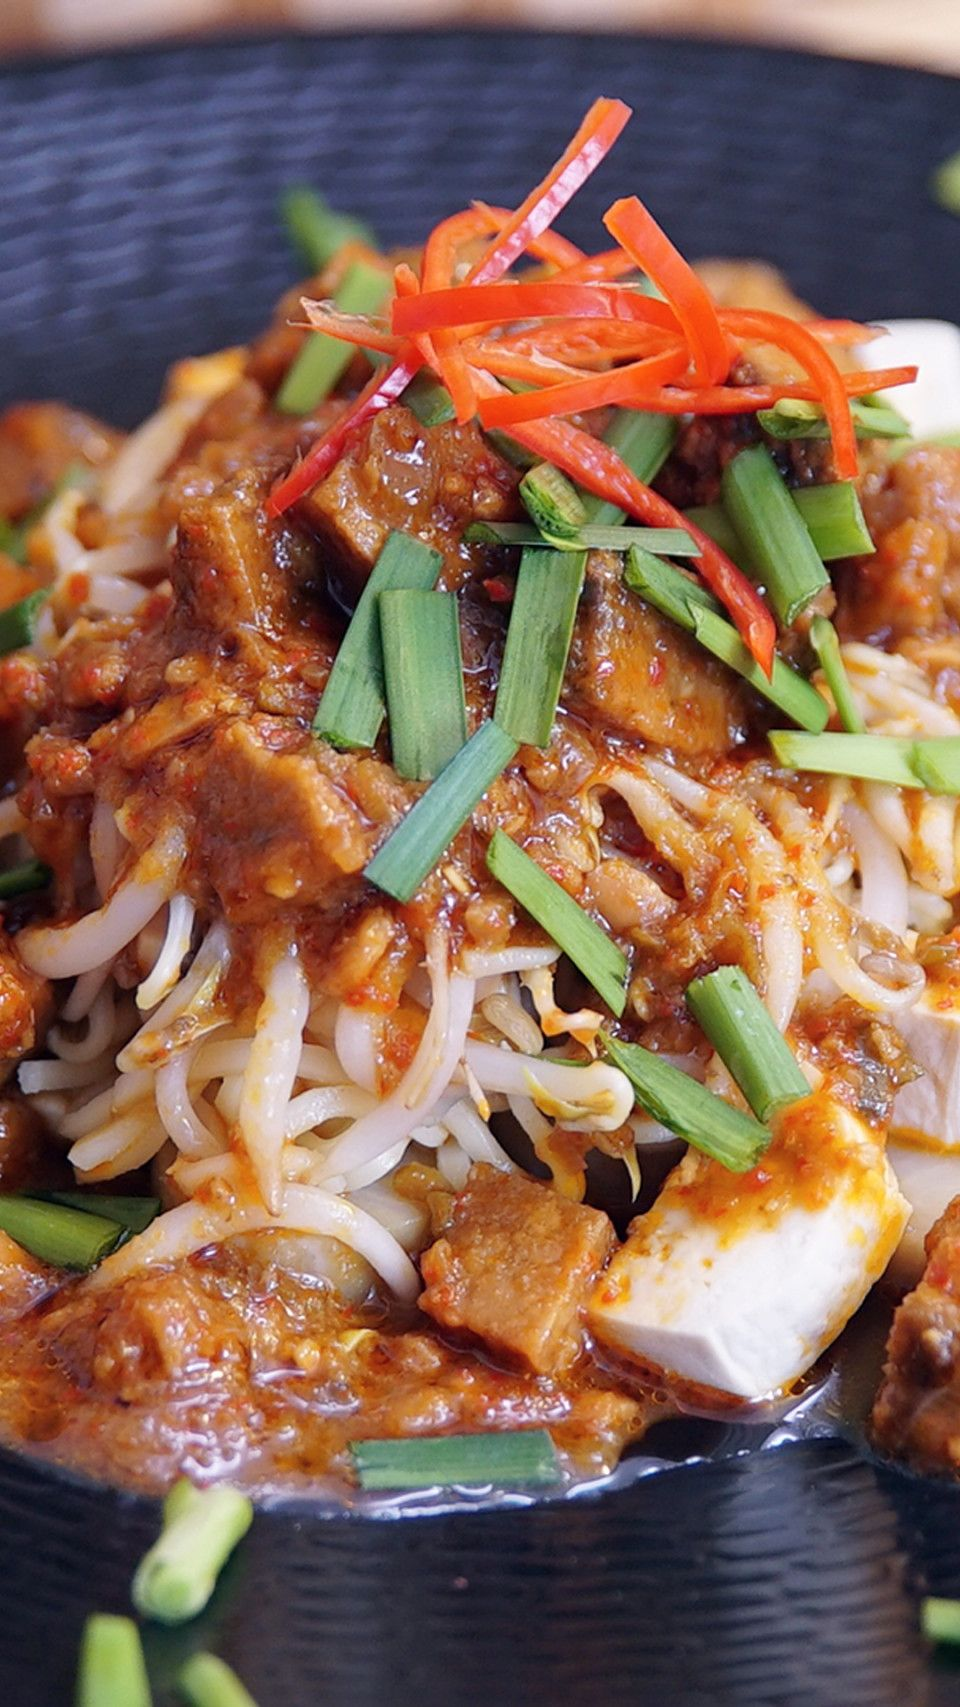 Tauge Goreng Resep Resep Resep Resep Masakan Indonesia Resep Masakan Asia